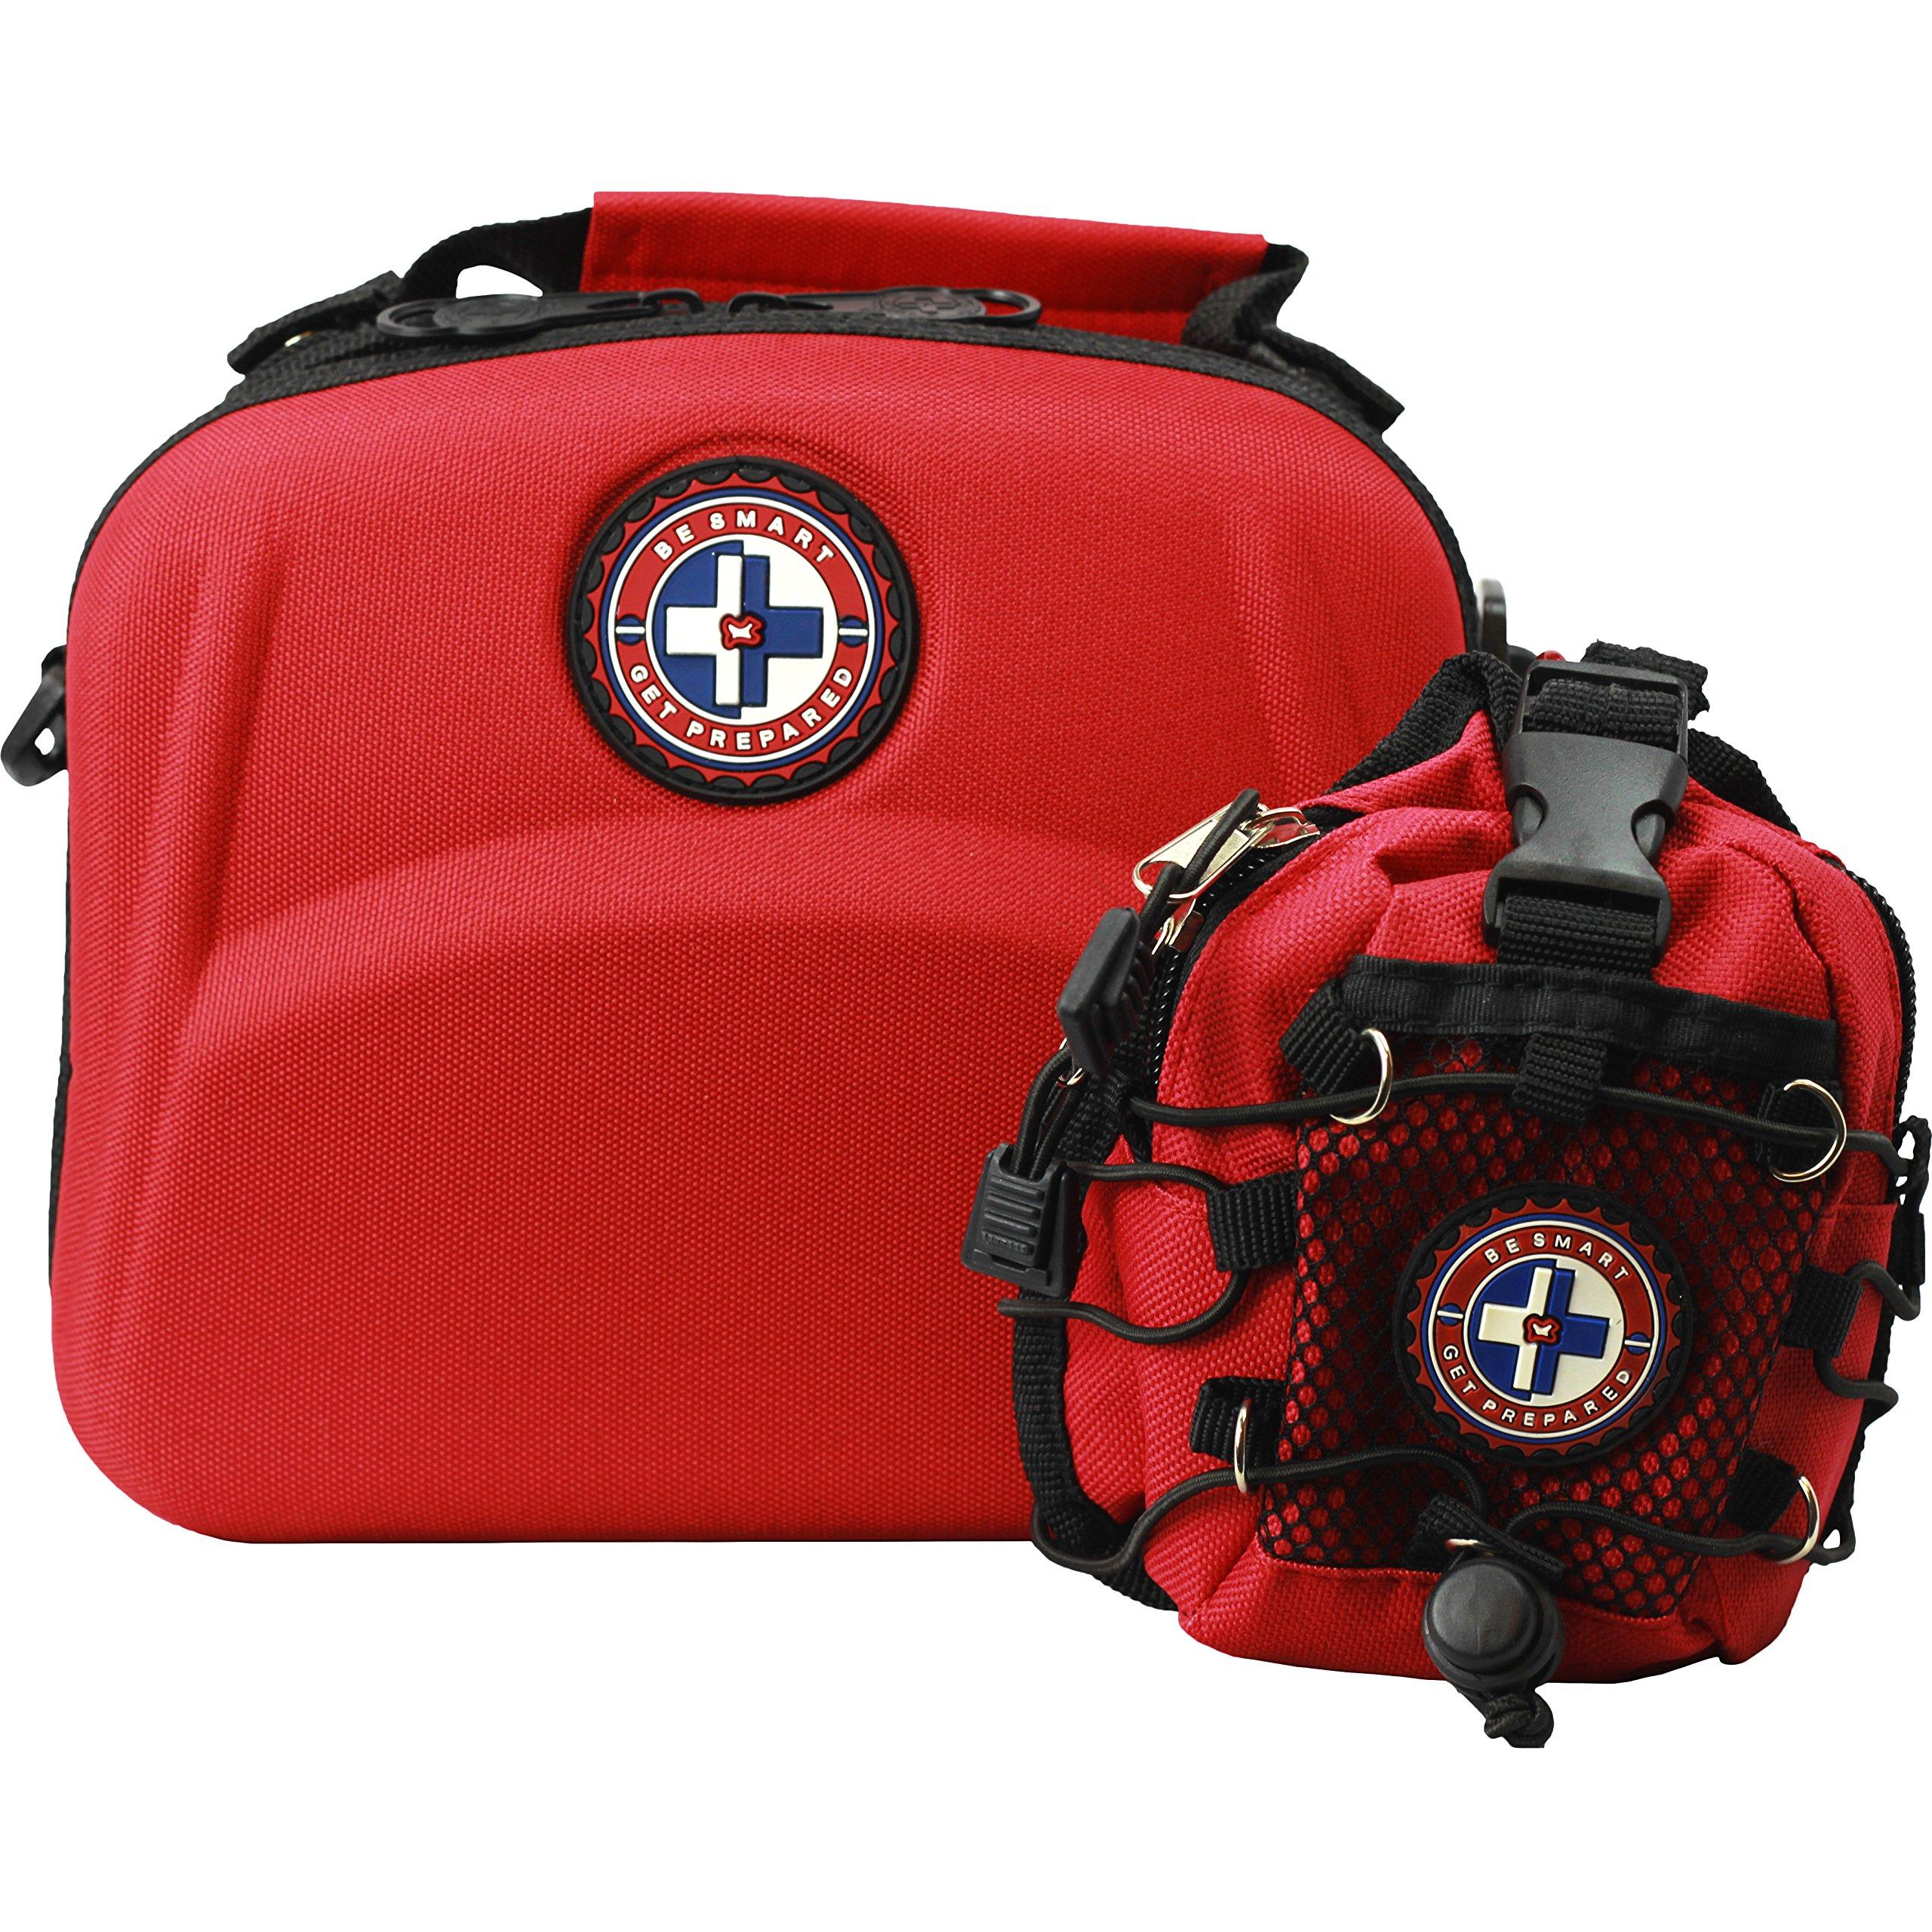 397 Piece First Aid Kit + BONUS Mini First Aid Kit by Be Smart Get Prepared